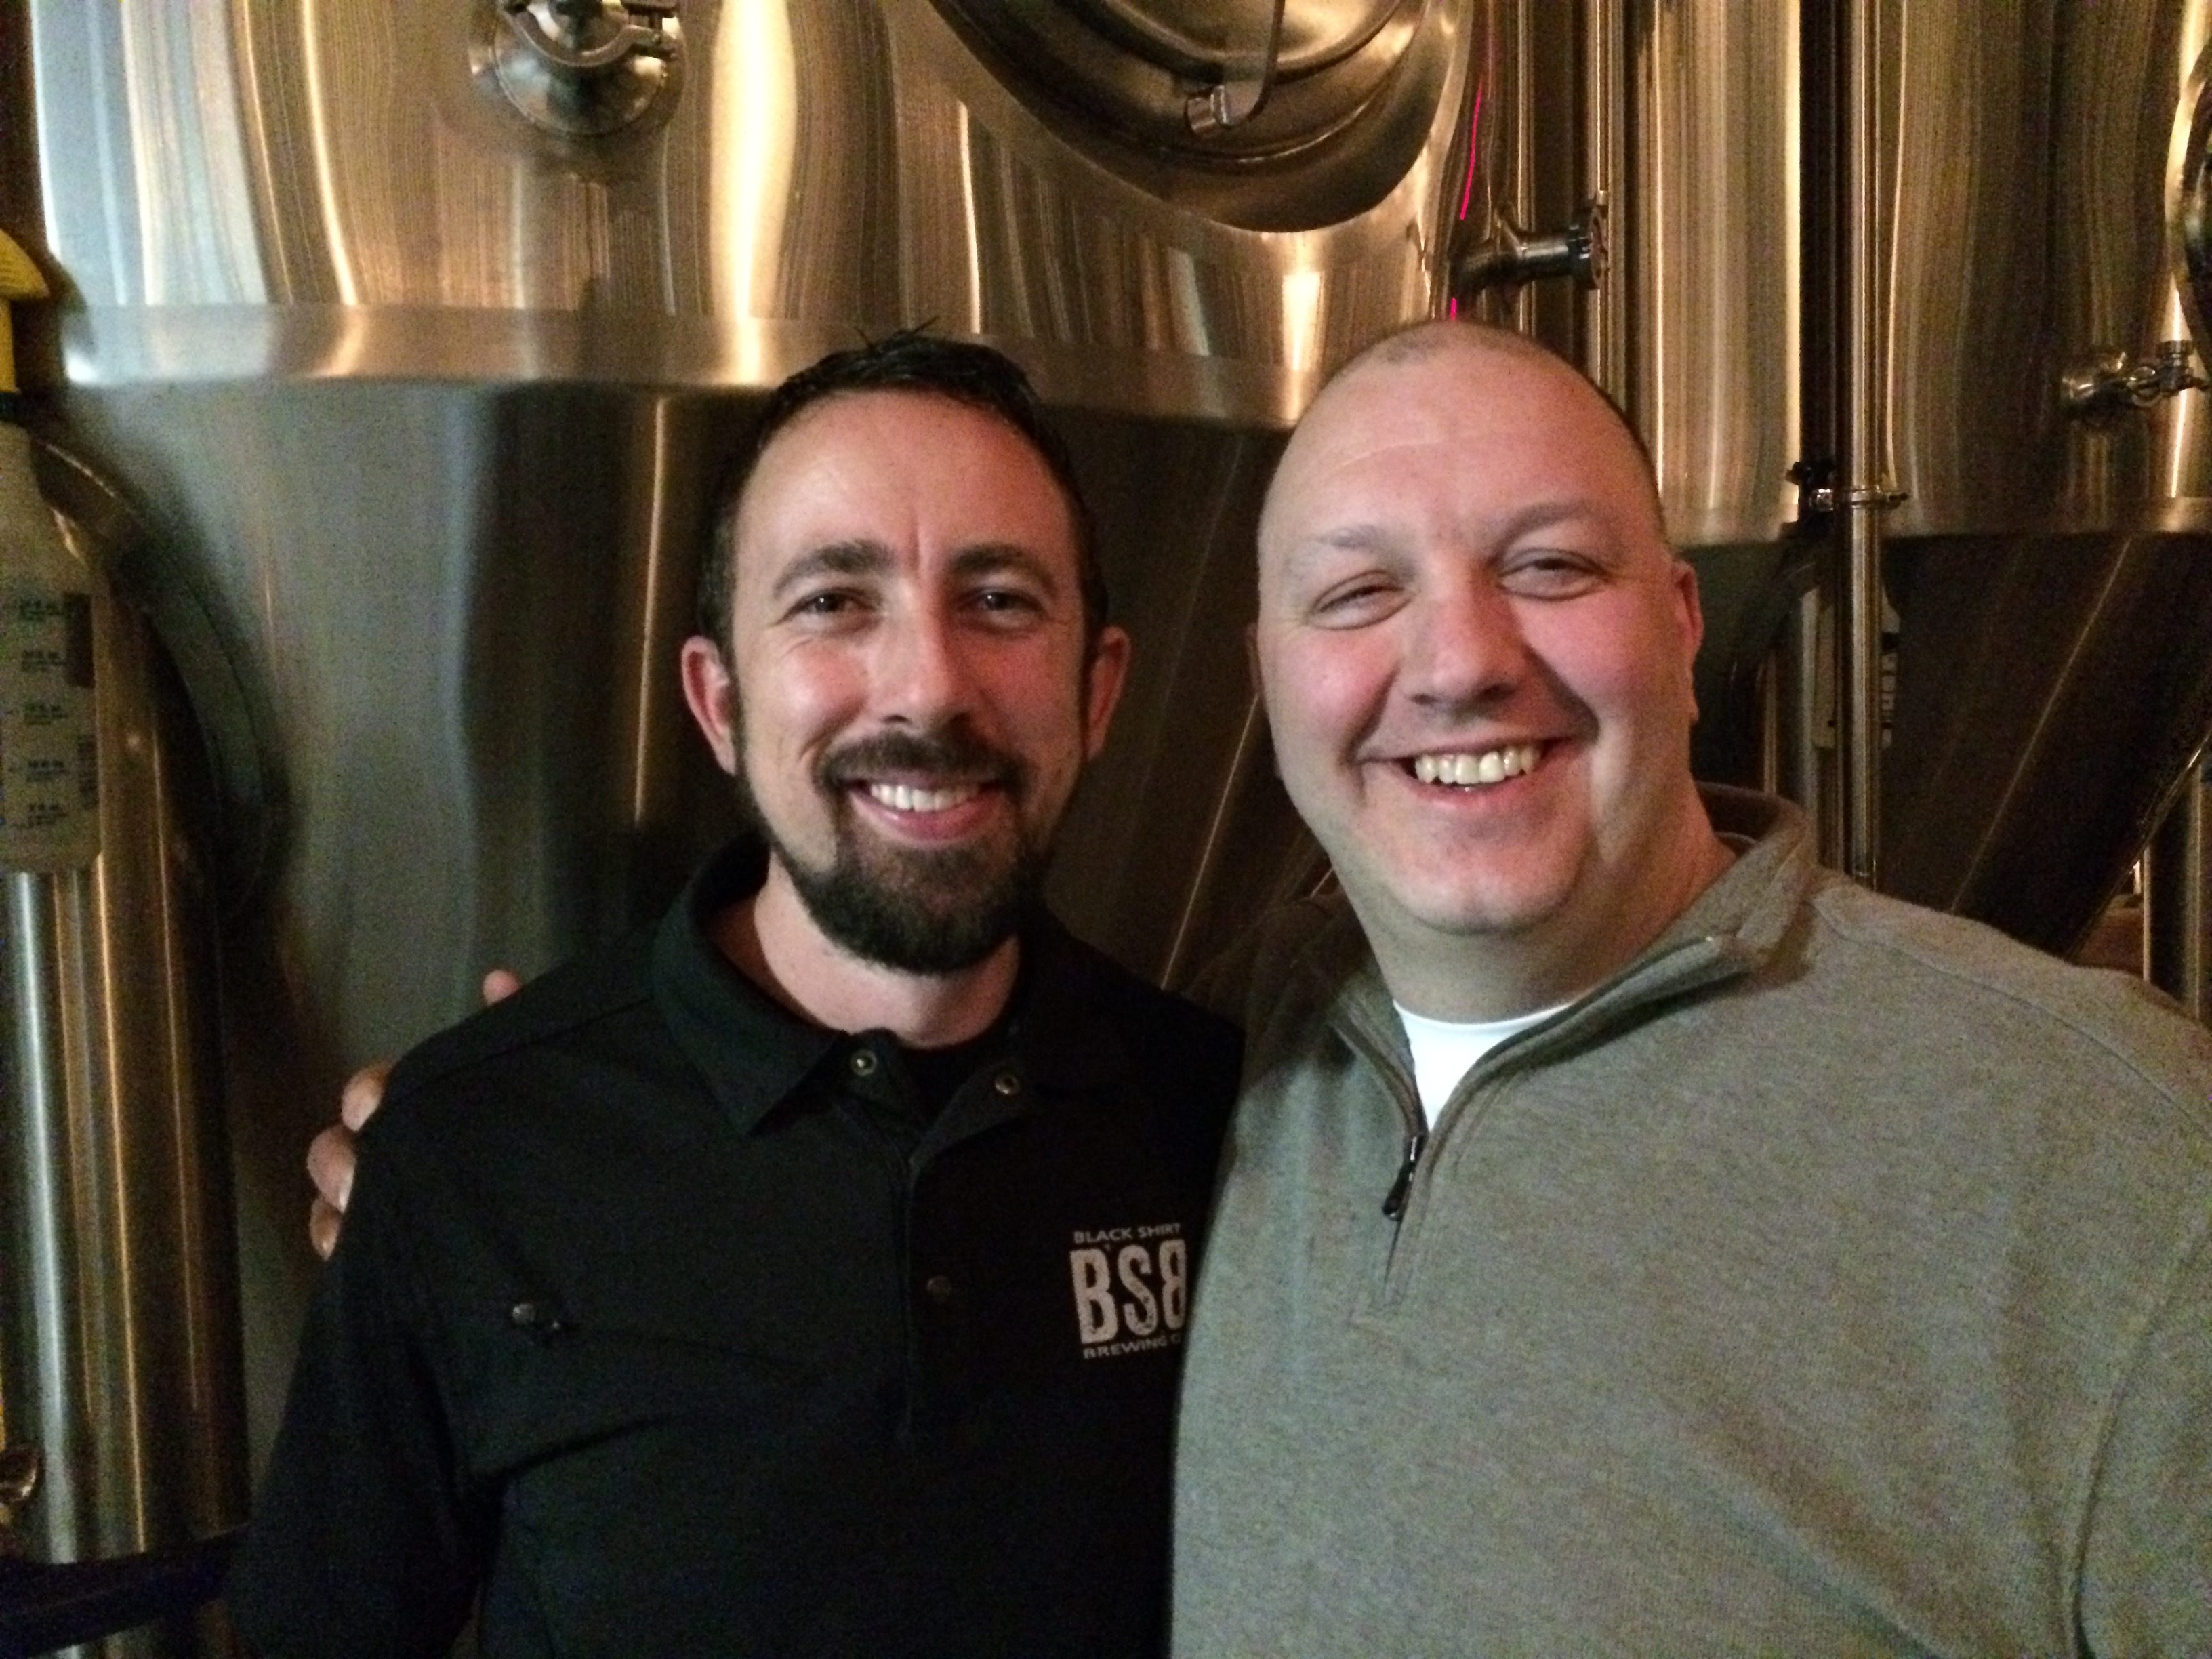 beer-black_shirt_brewery-denver_co-bar-microbrewery-tf_2016__8_